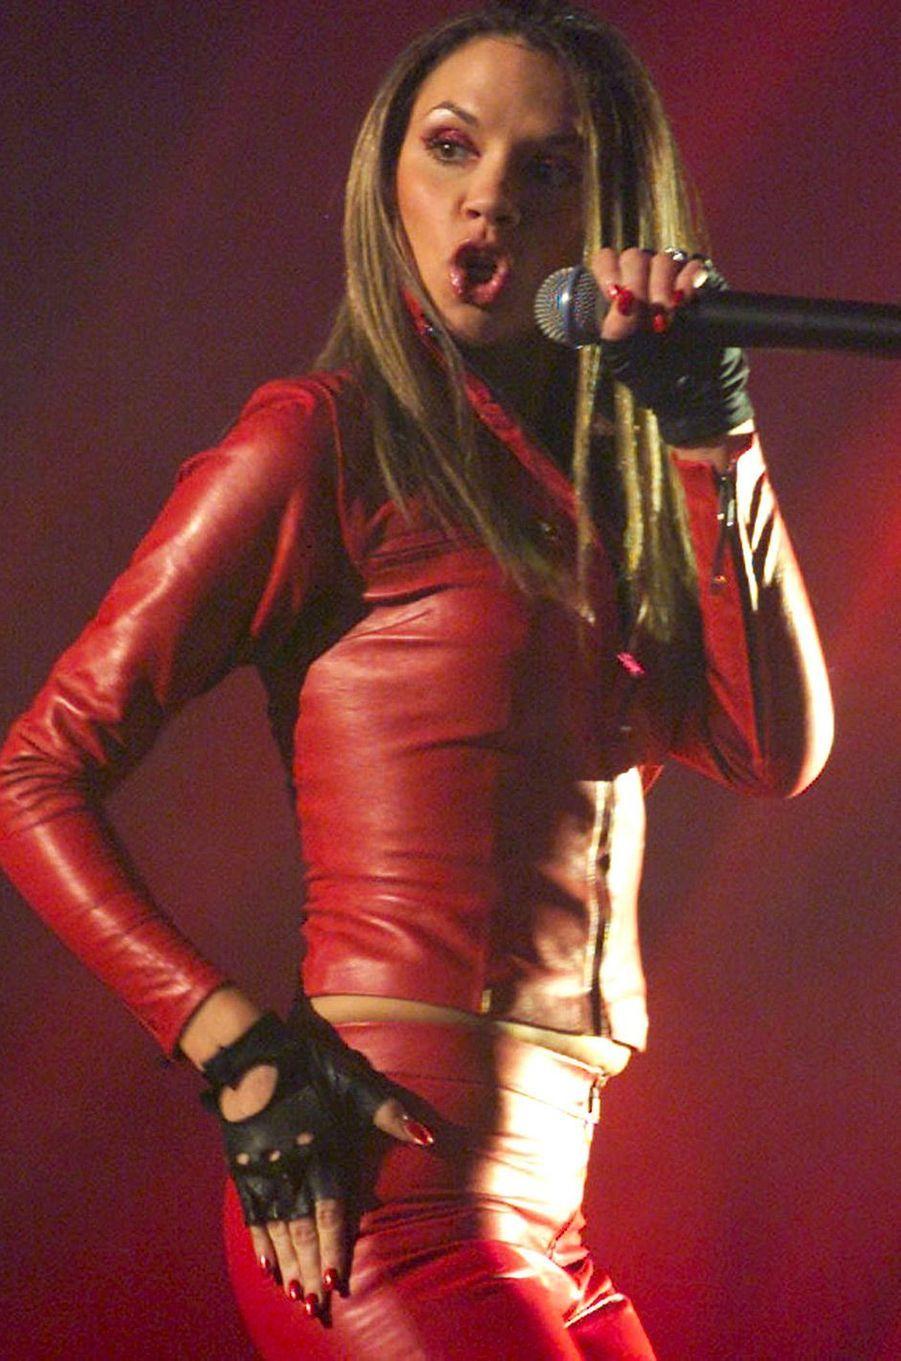 Victoria Beckham, aka Posh Spice, le 16 novembre 2000